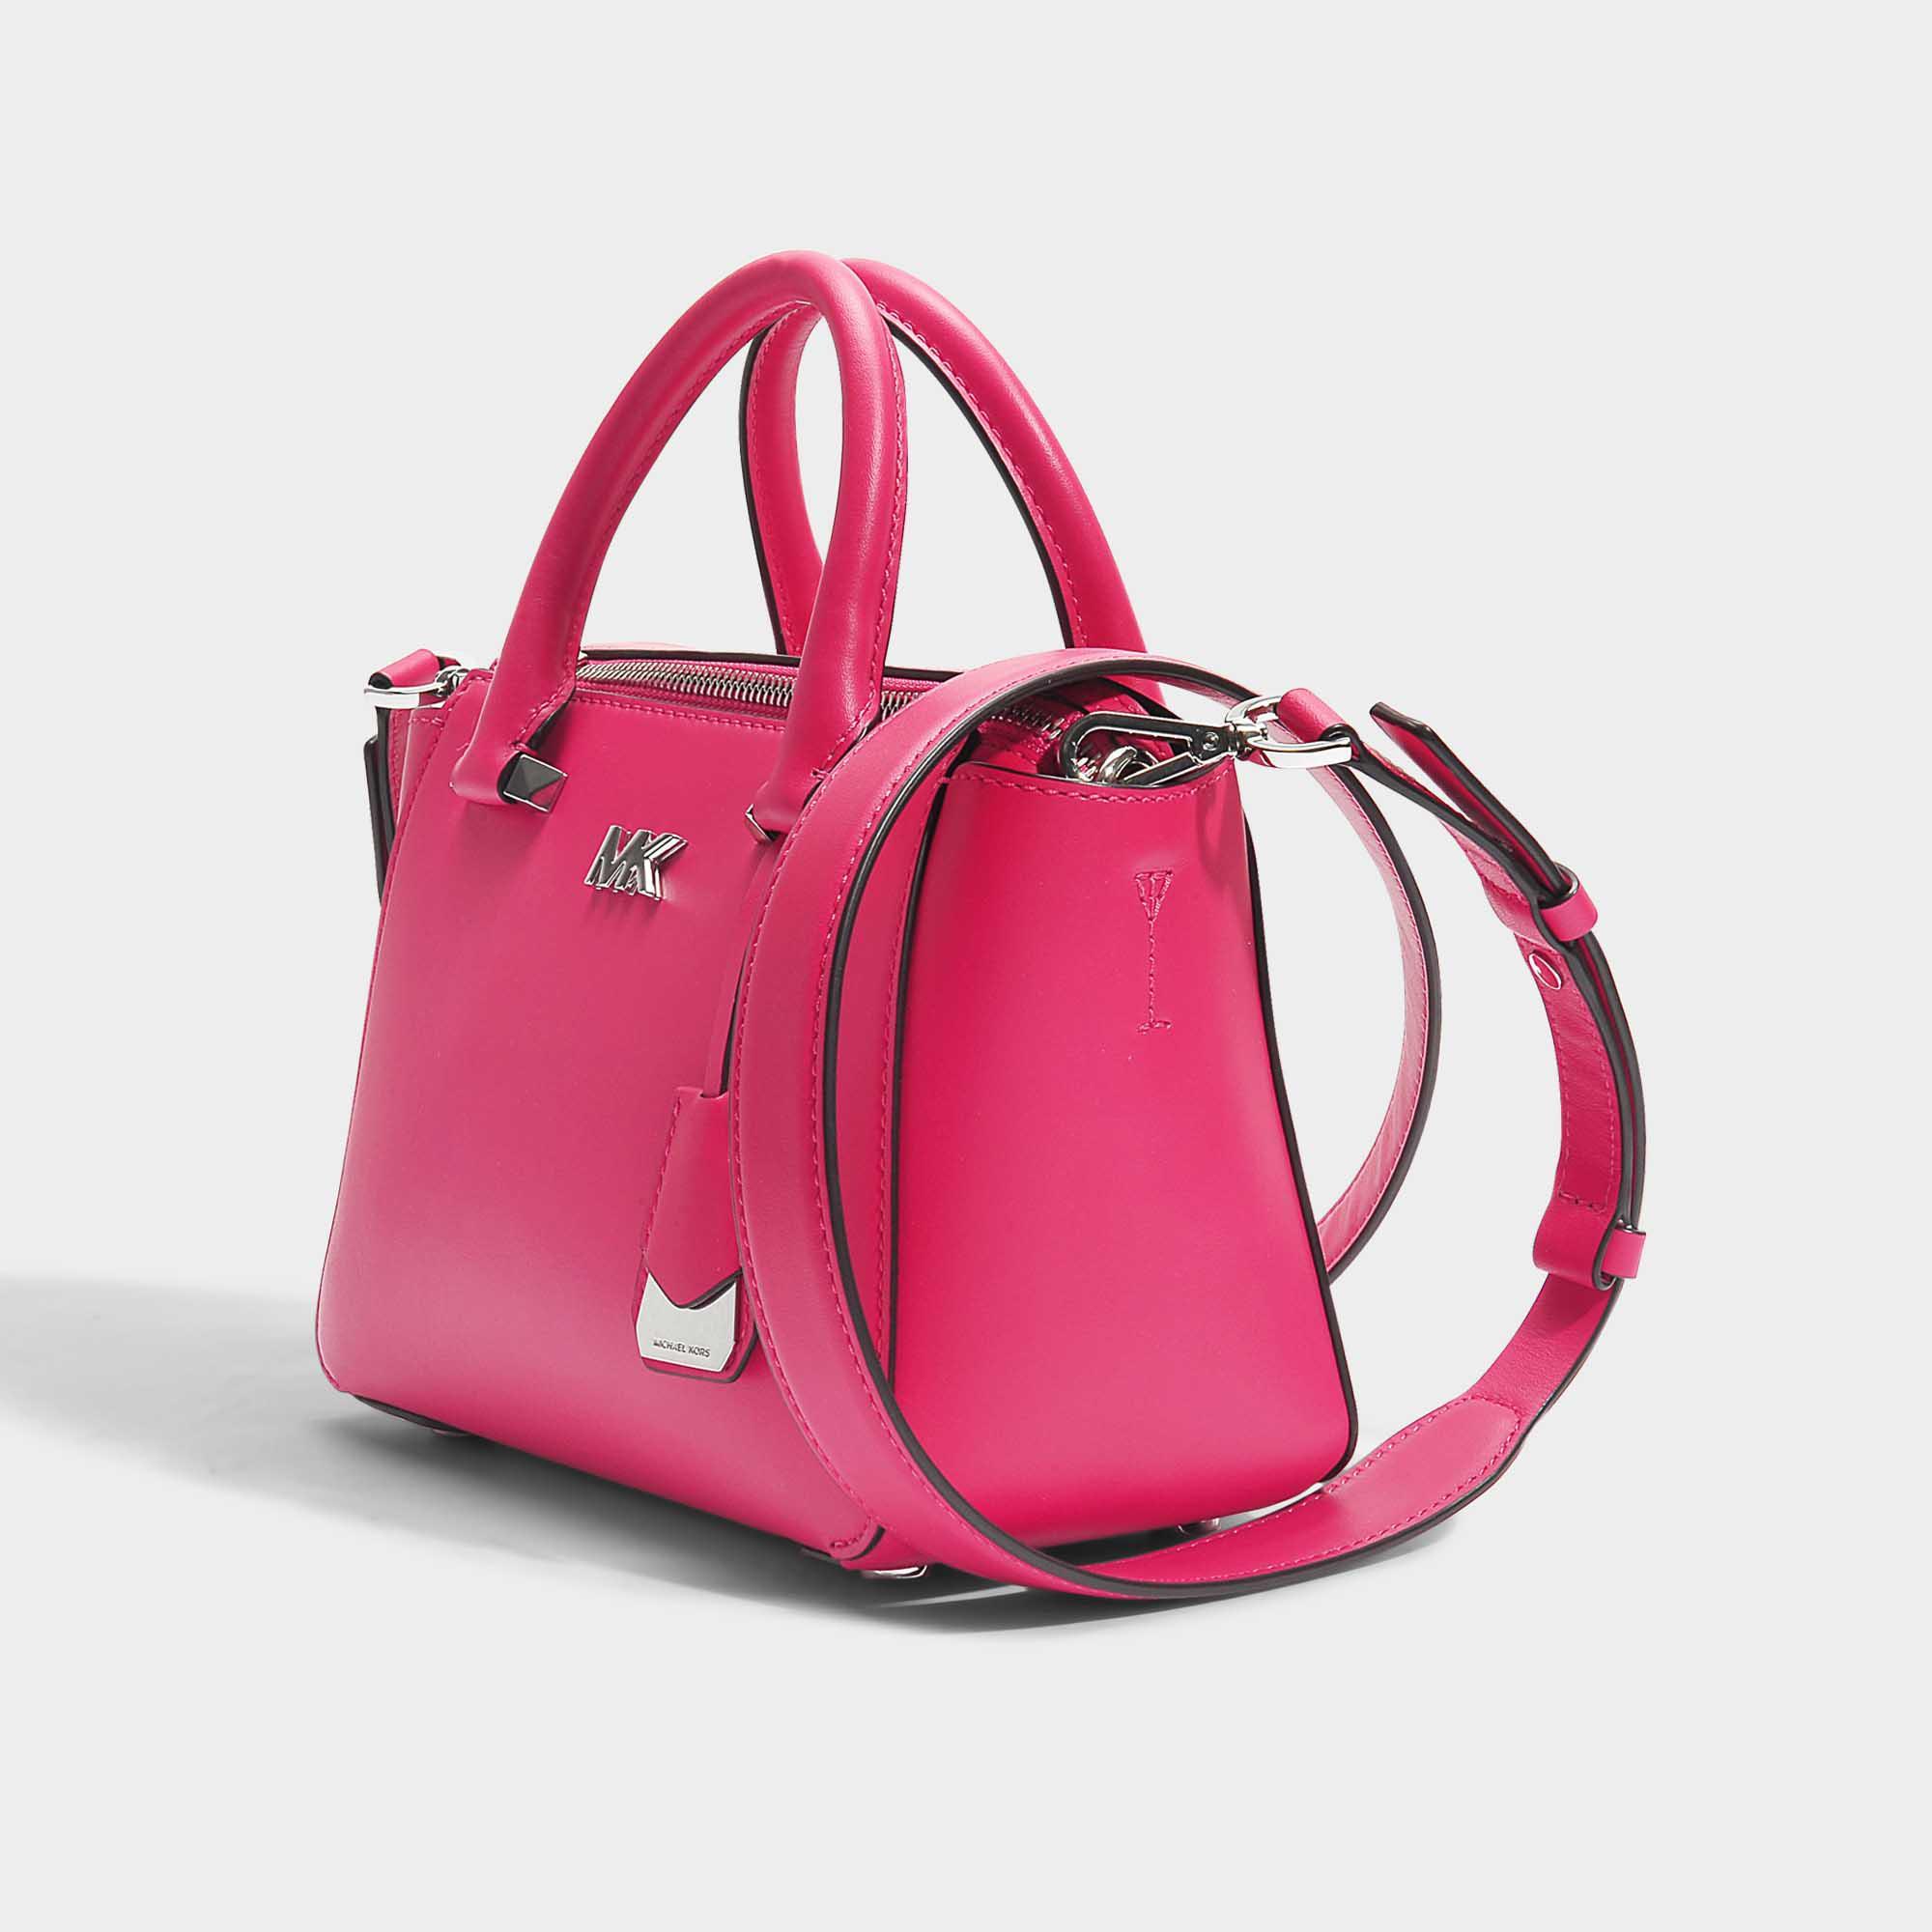 Lyst - MICHAEL Michael Kors Nolita Mini Messenger Bag In Ultra Pink ... 9afdf38782